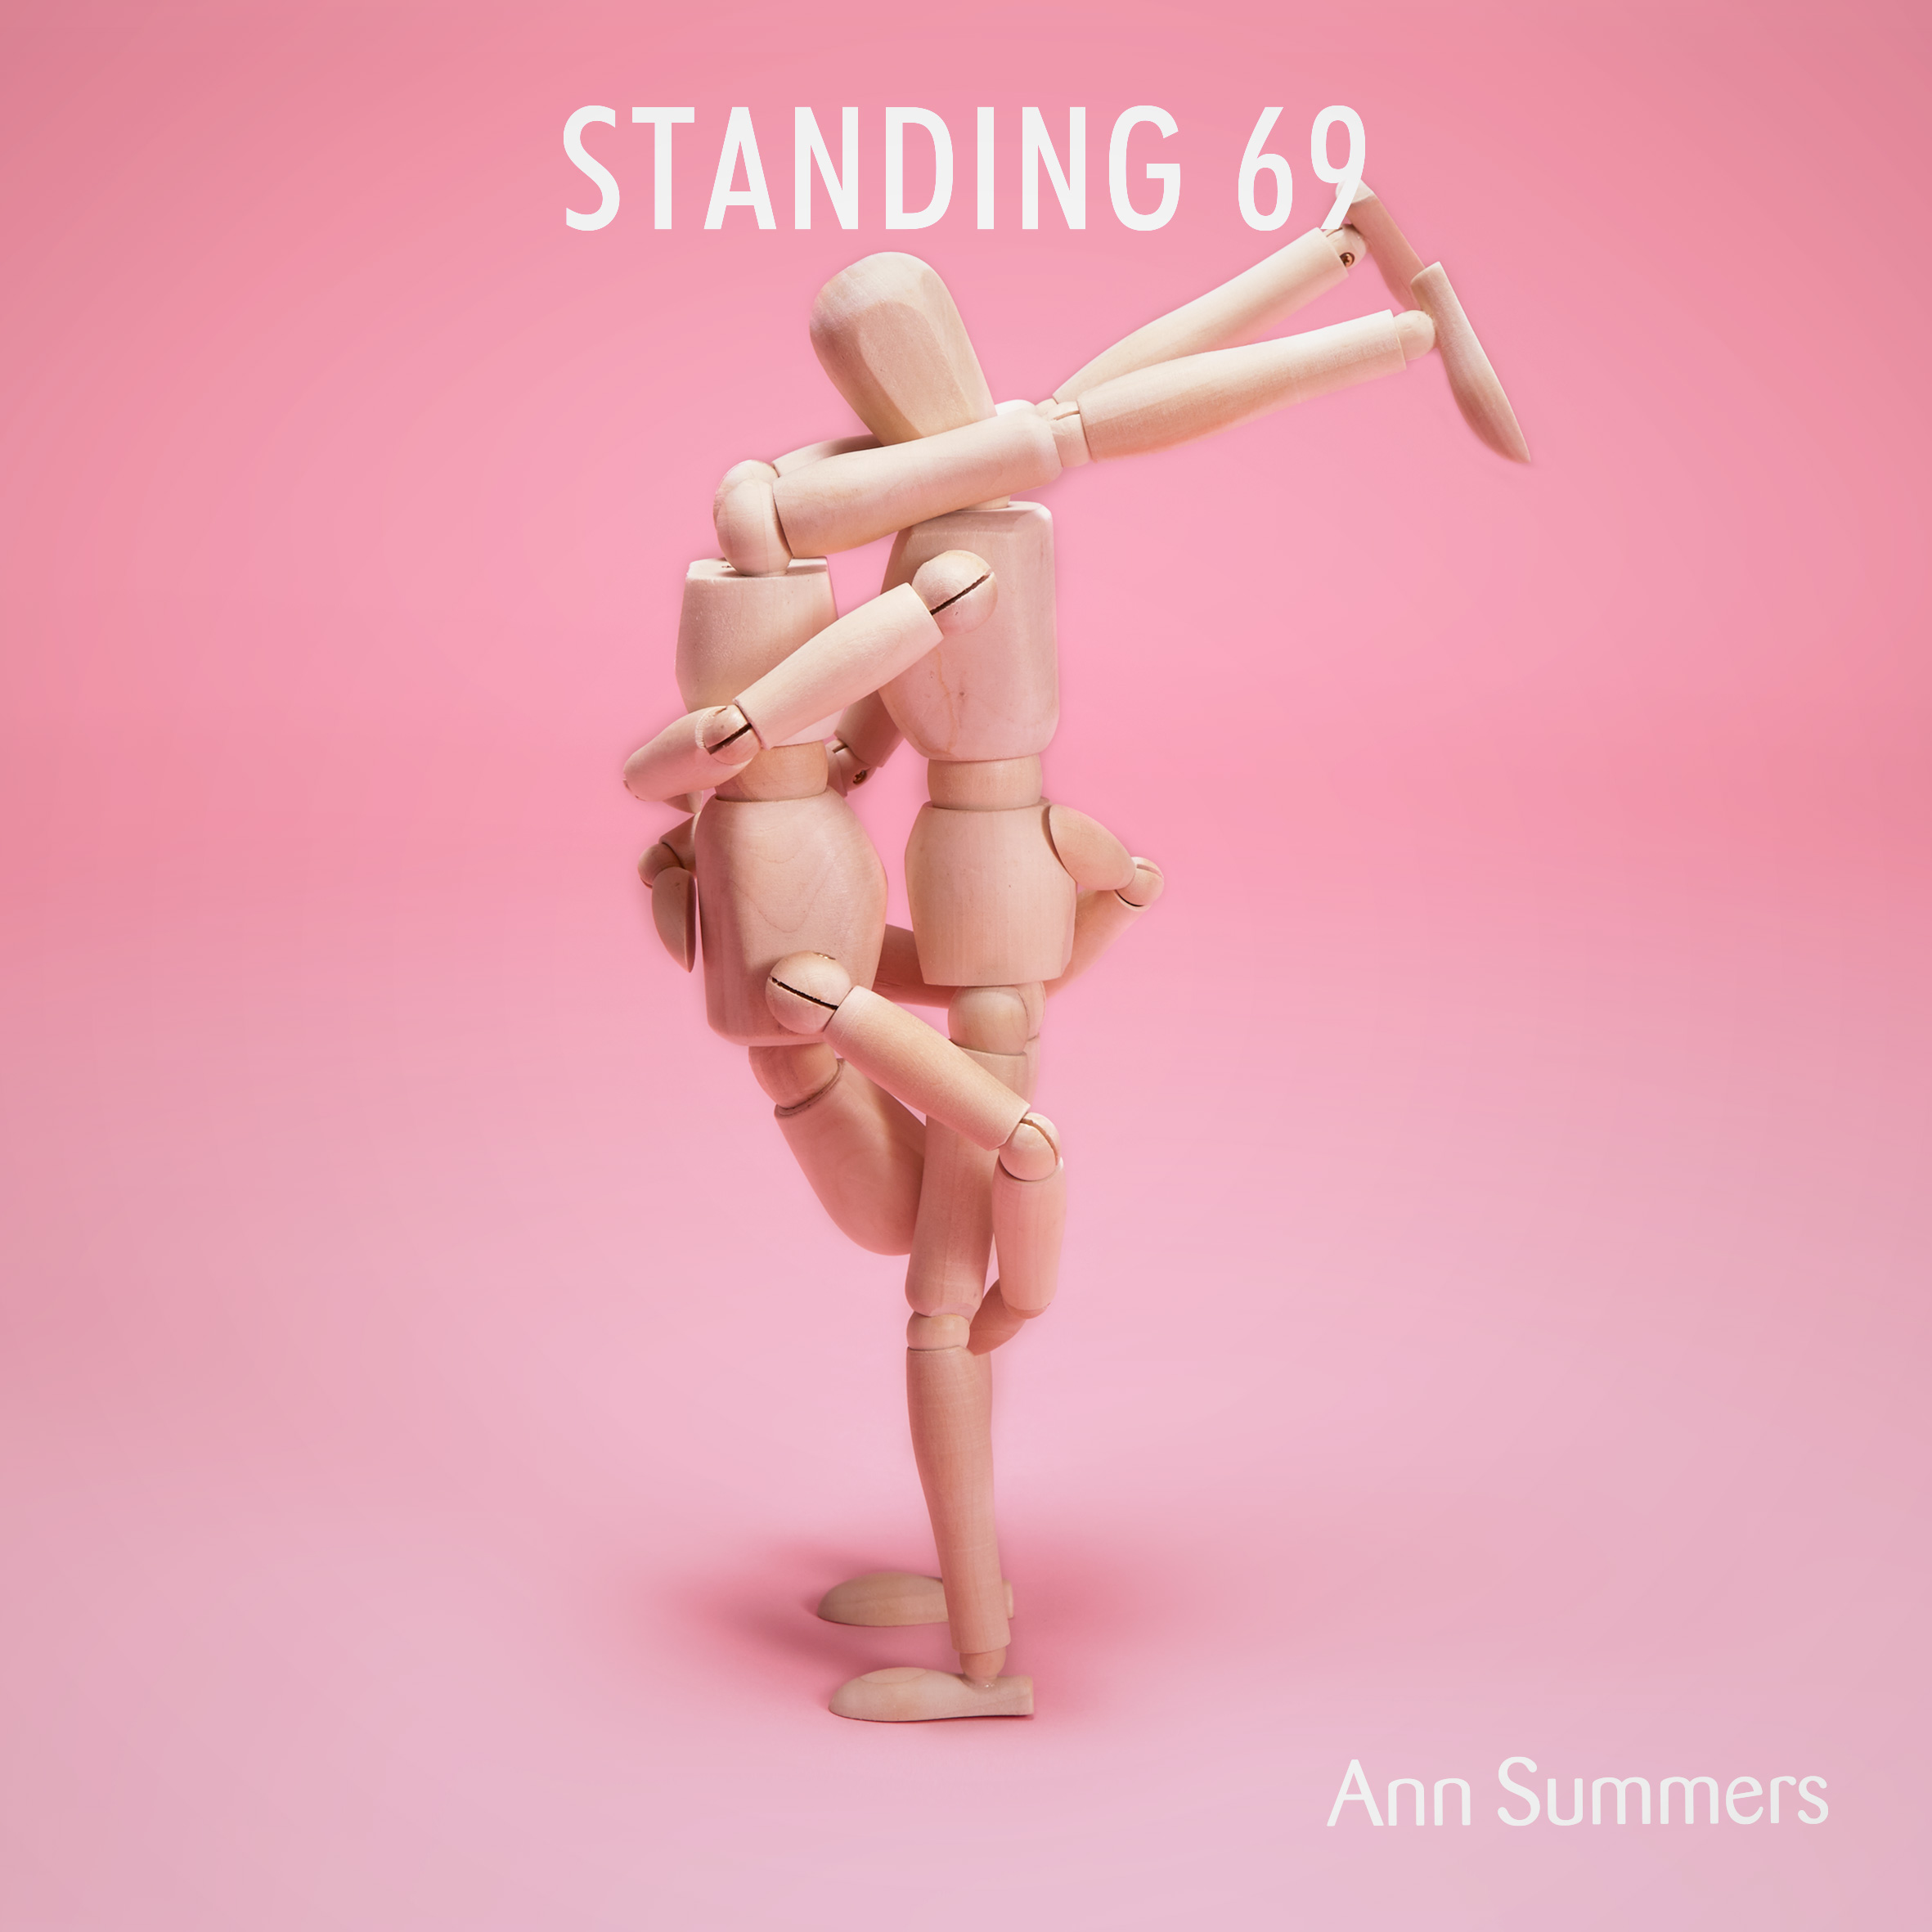 standing 69